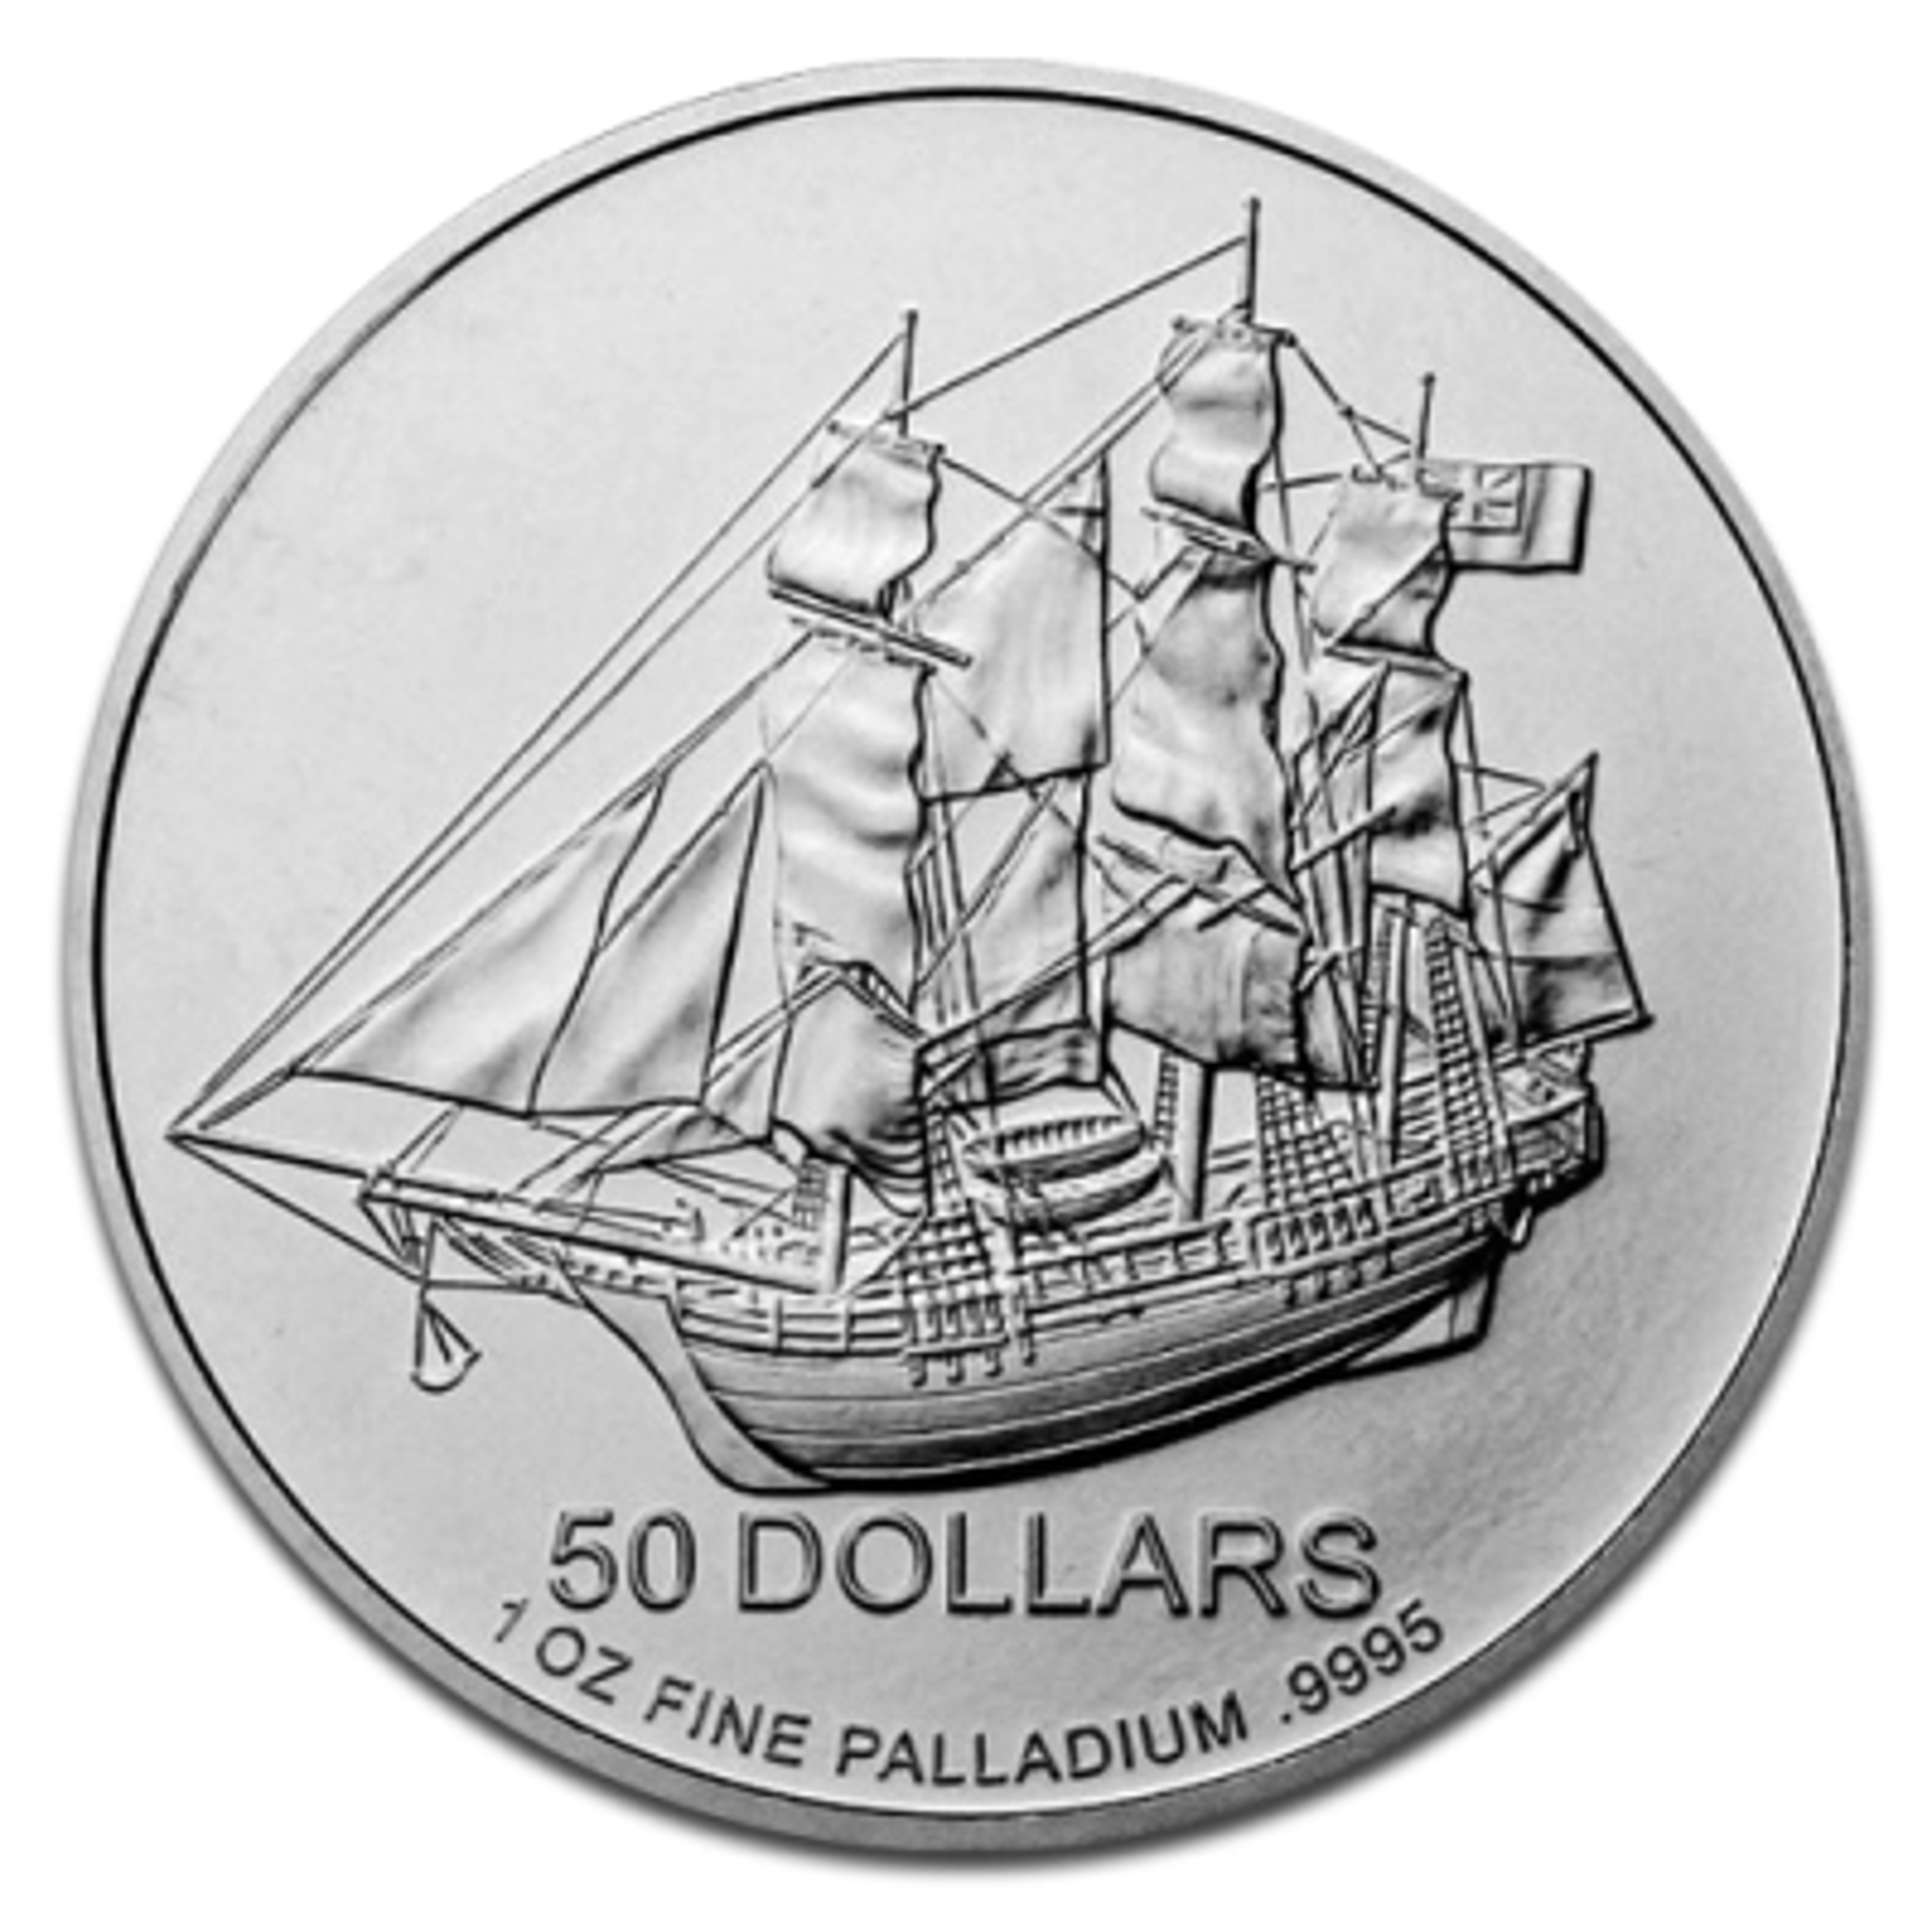 1 Troy ounce Palladium coin Cook Islands